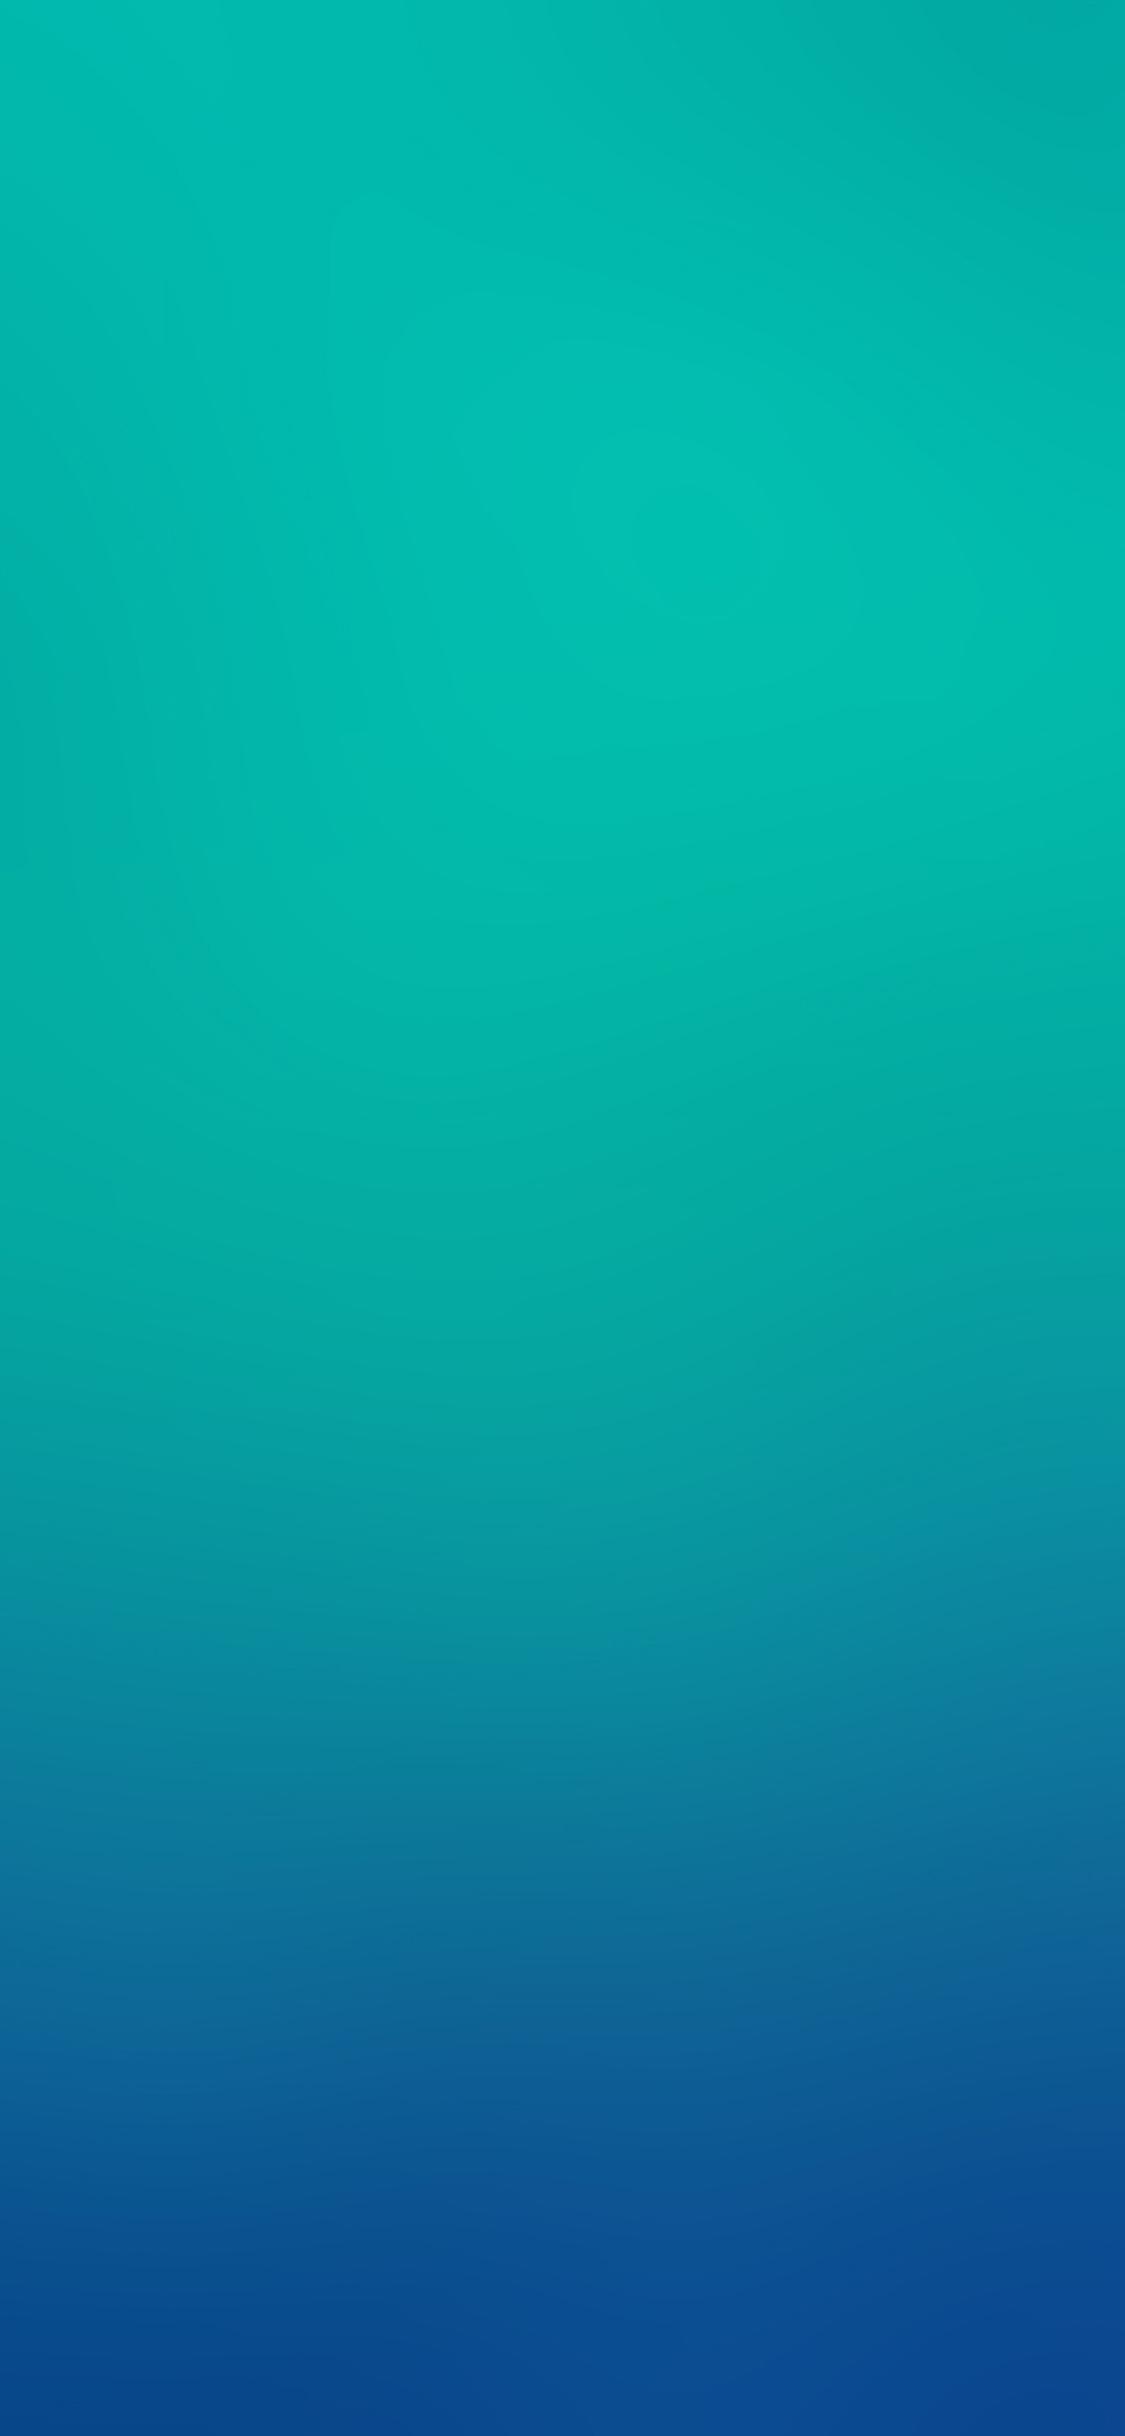 iPhoneXpapers.com-Apple-iPhone-wallpaper-sb41-wallpaper-blue-grass-blur